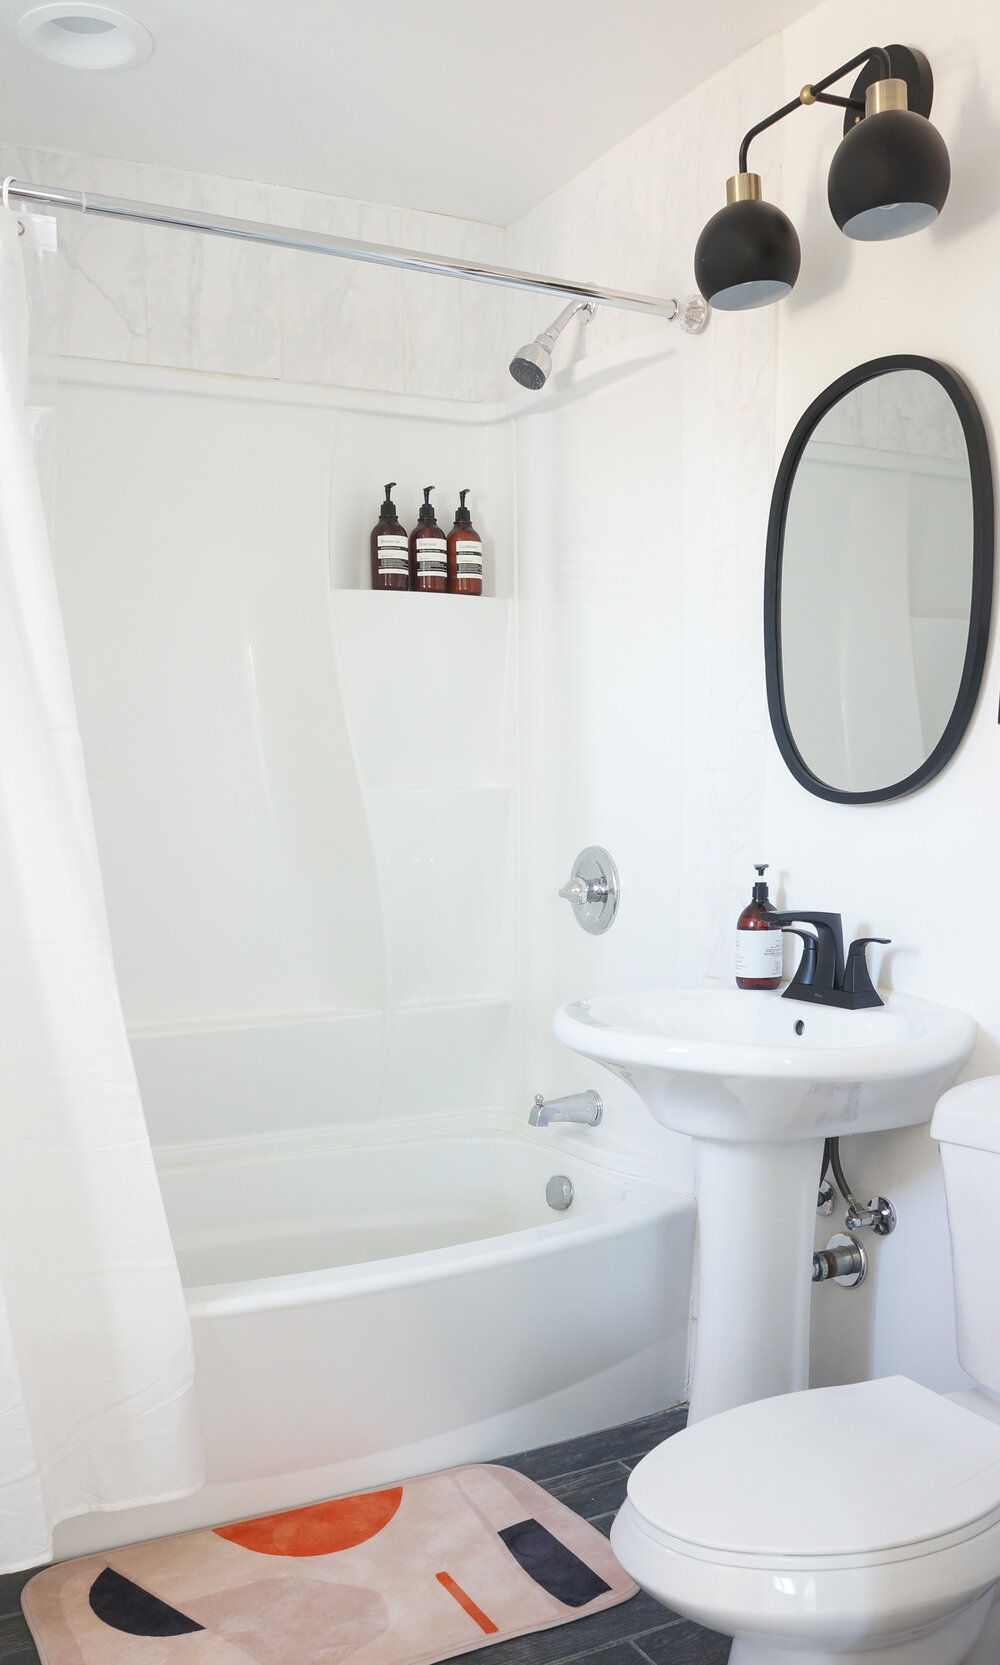 How To Install A Bathroom Light Fixture, Young House Love Bathroom